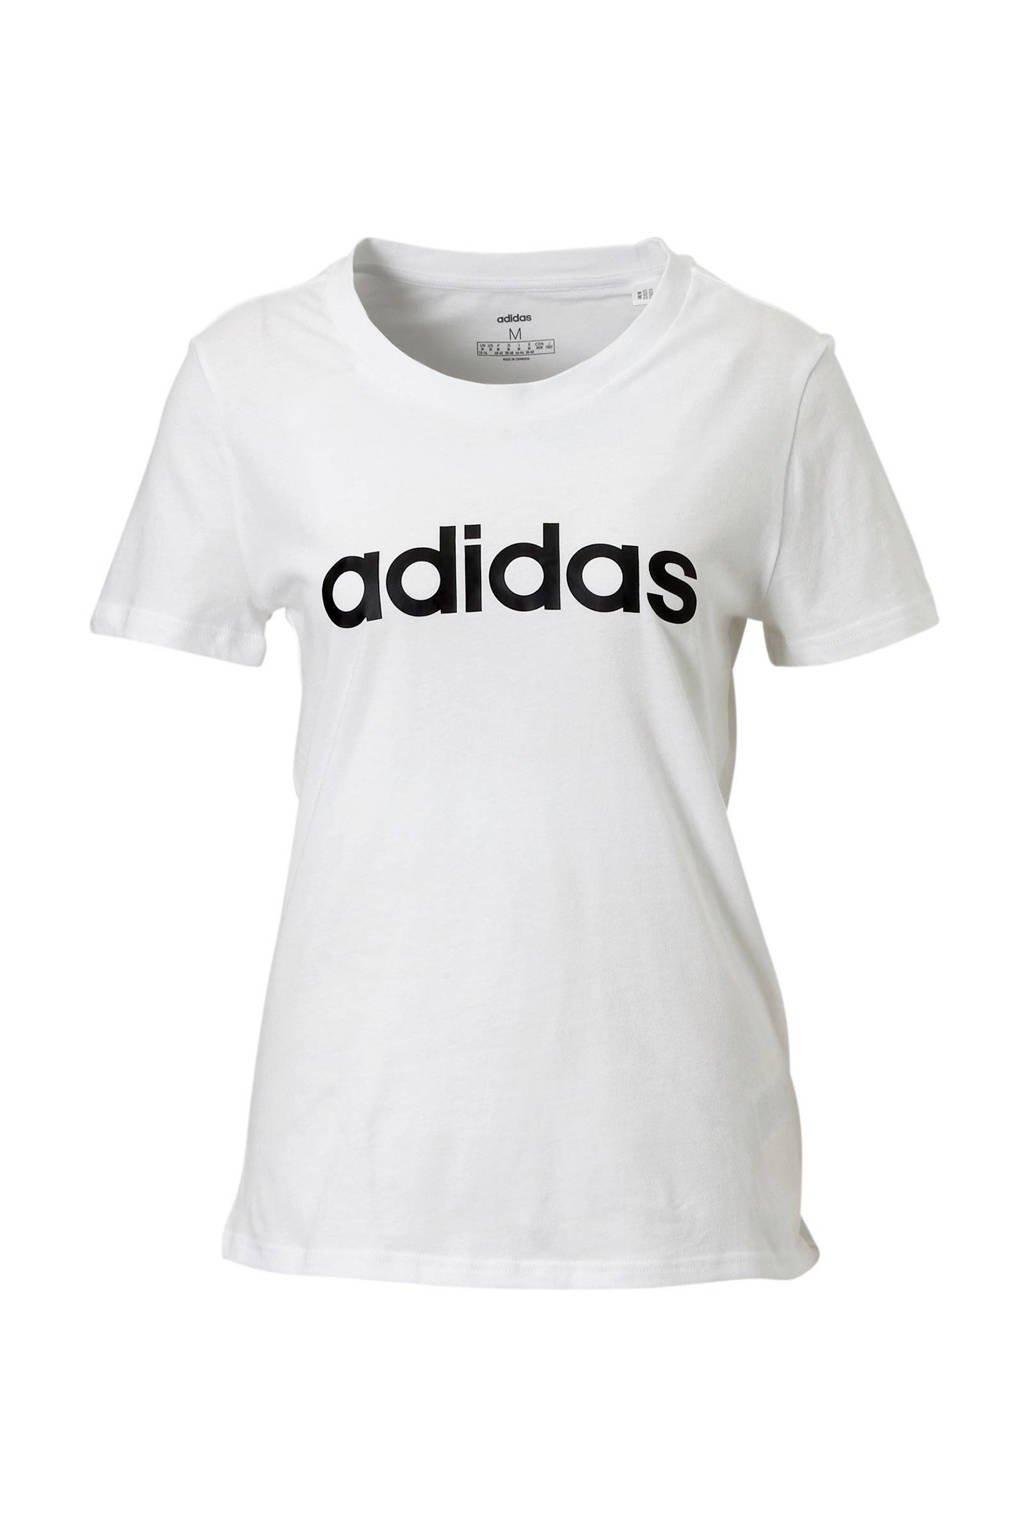 adidas Performance sport T-shirt wit/zwart, Wit/zwart